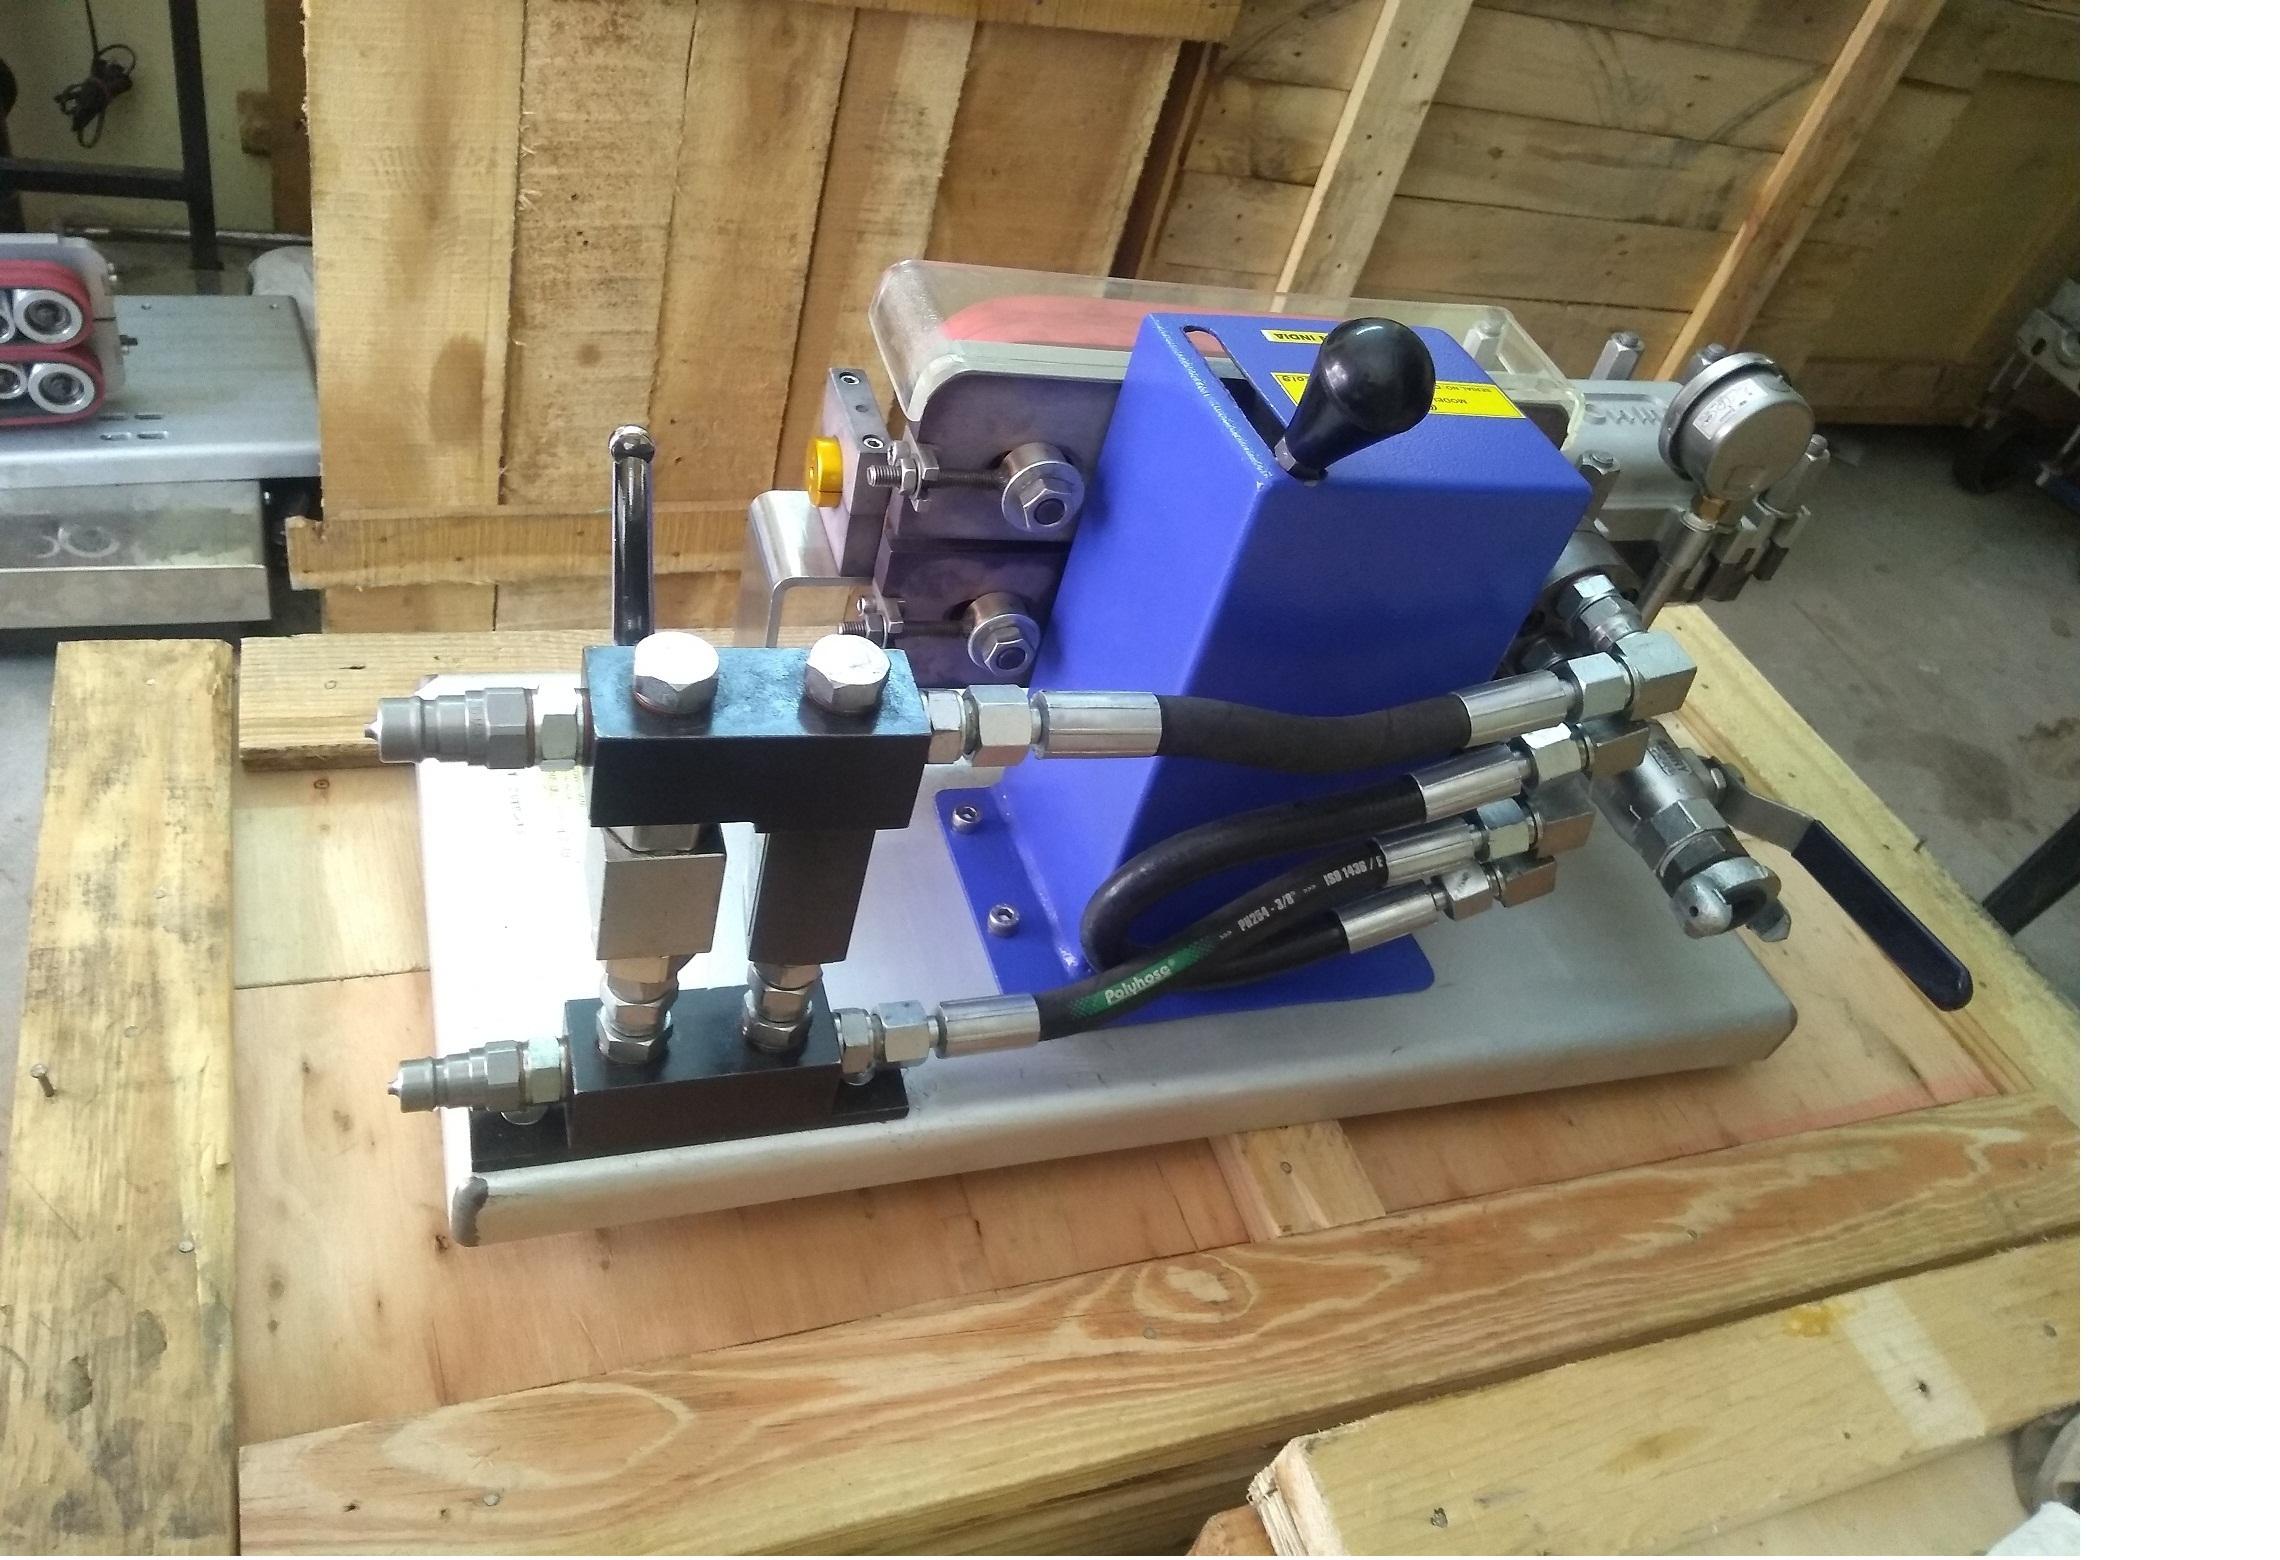 Gowin Minijet Micro Fiber Pneumatic Cable Blowing Machine